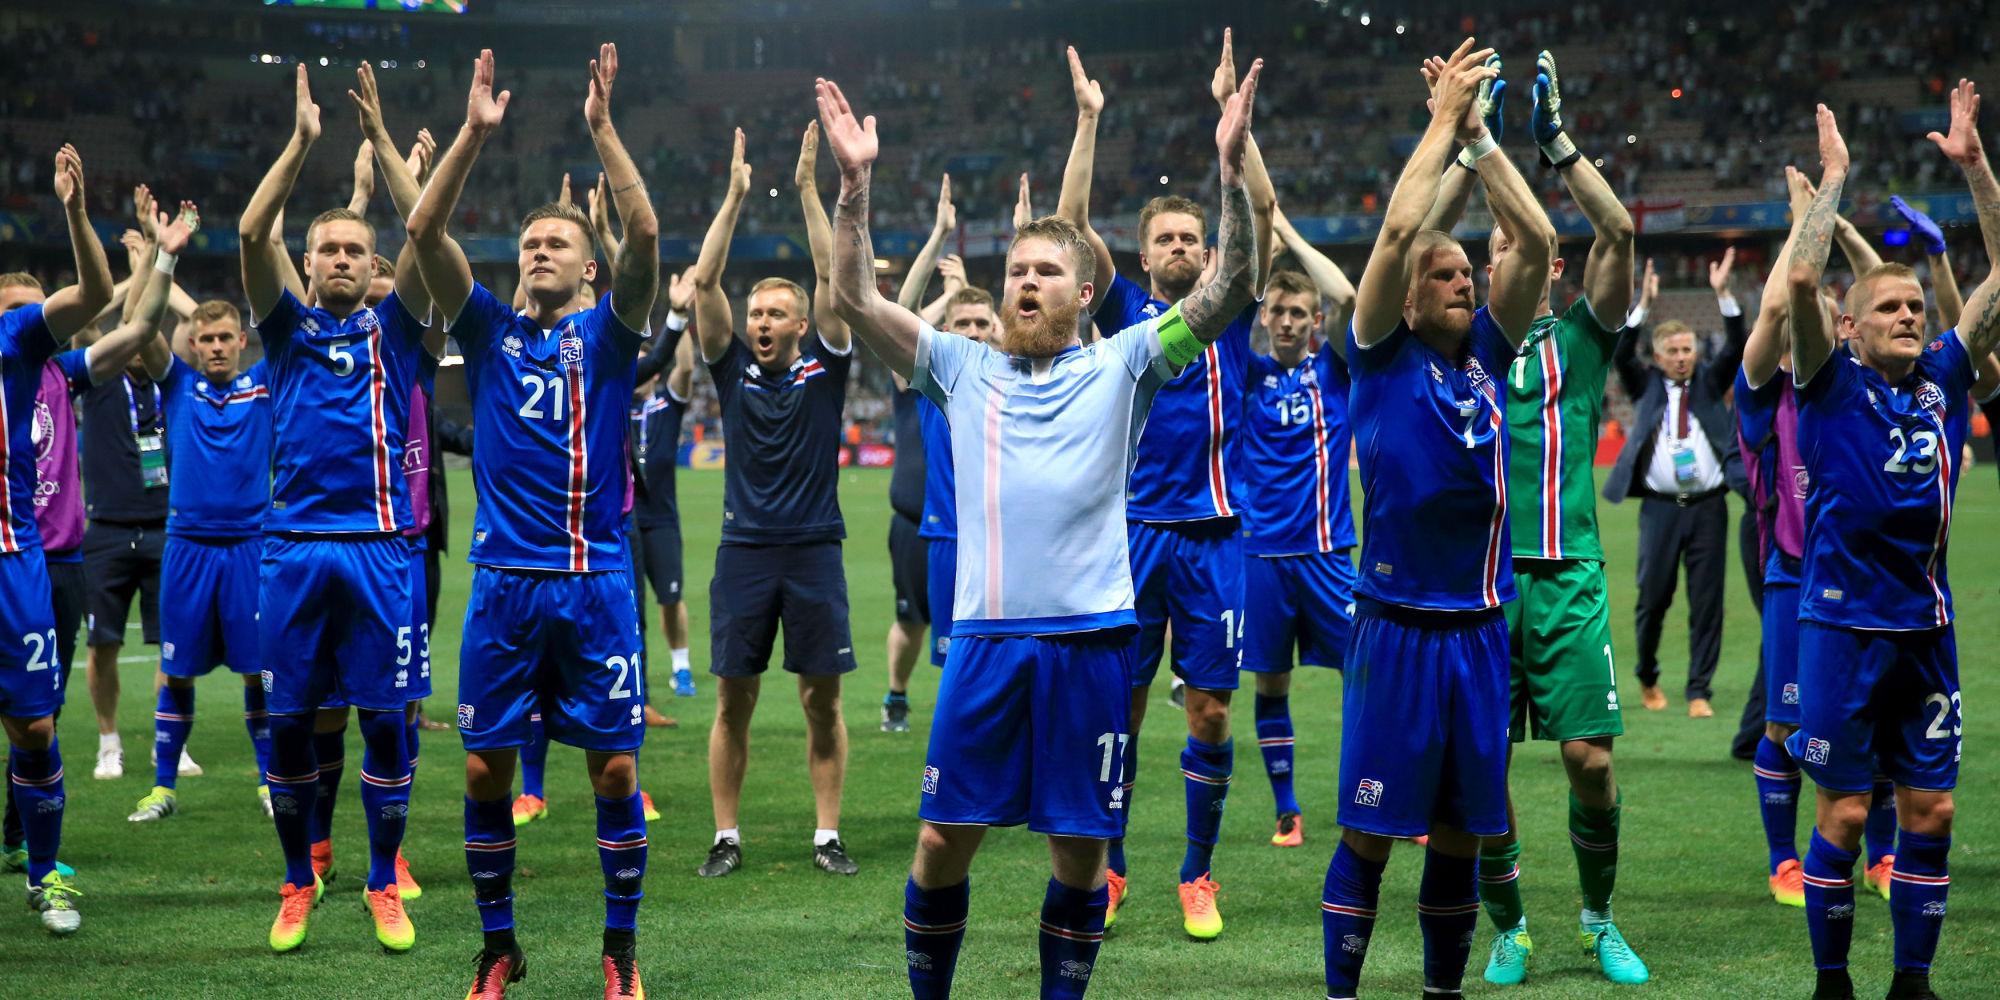 Inghilterra vs Islanda - UEFA Euro 2016